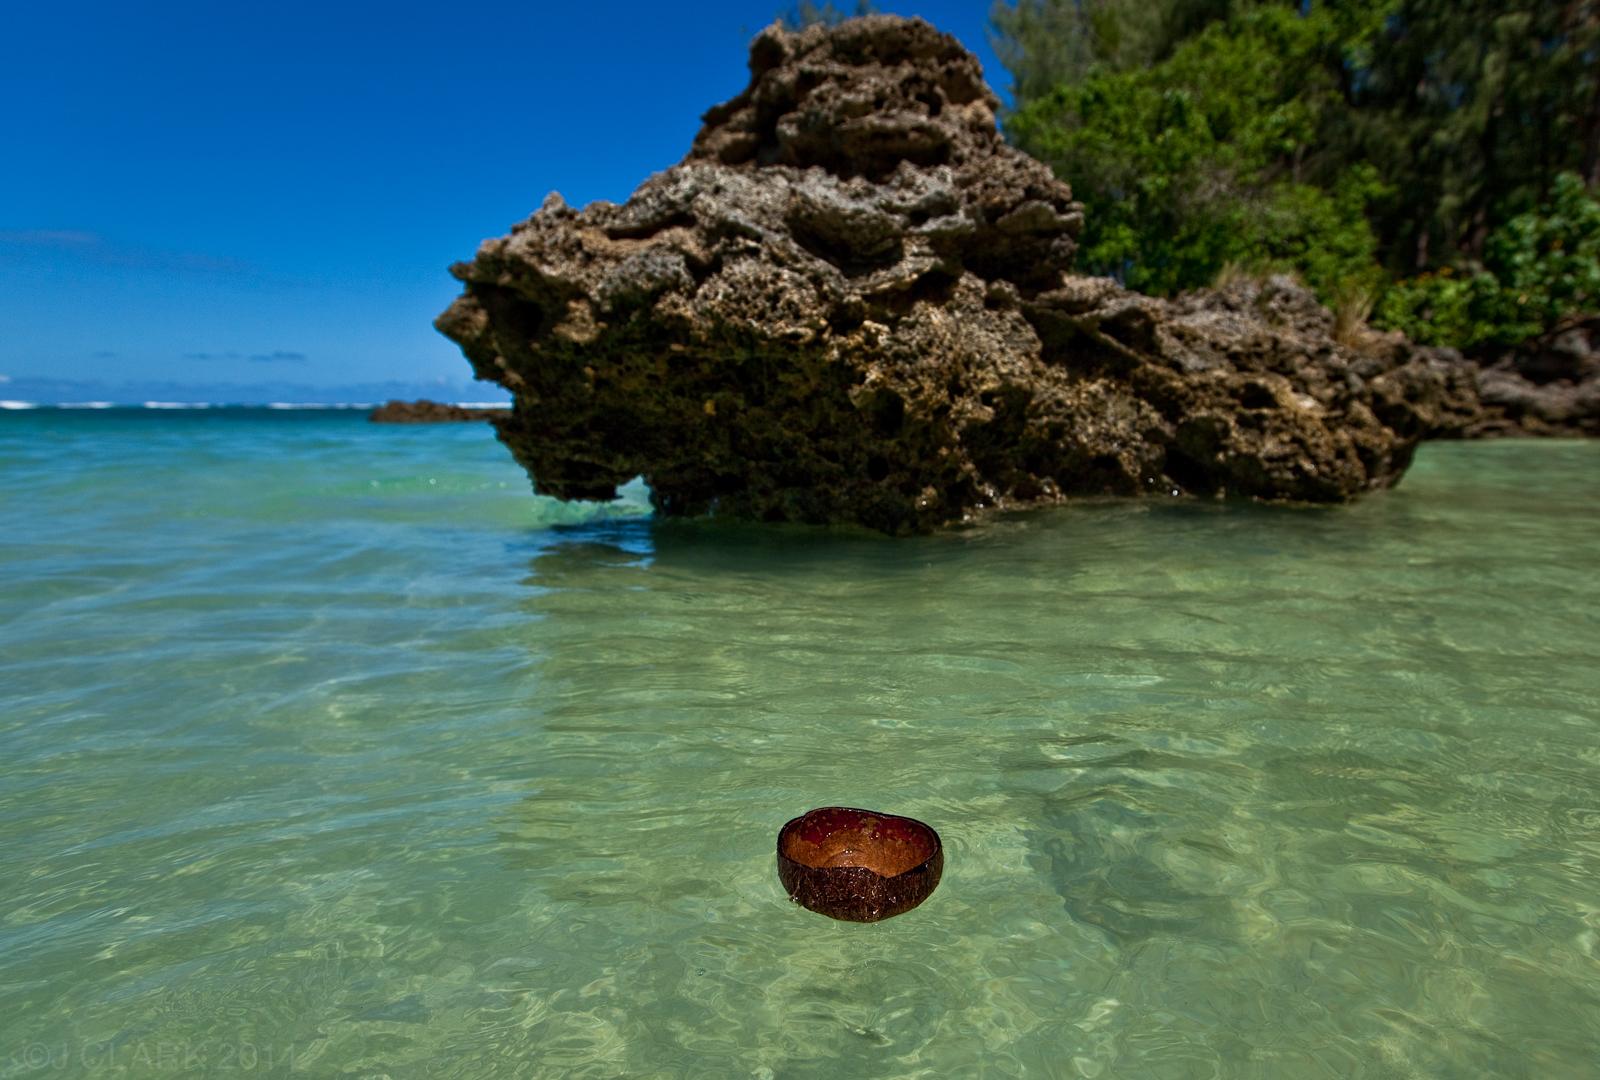 COCONUT SHELL ADRIFT IN VANUATU